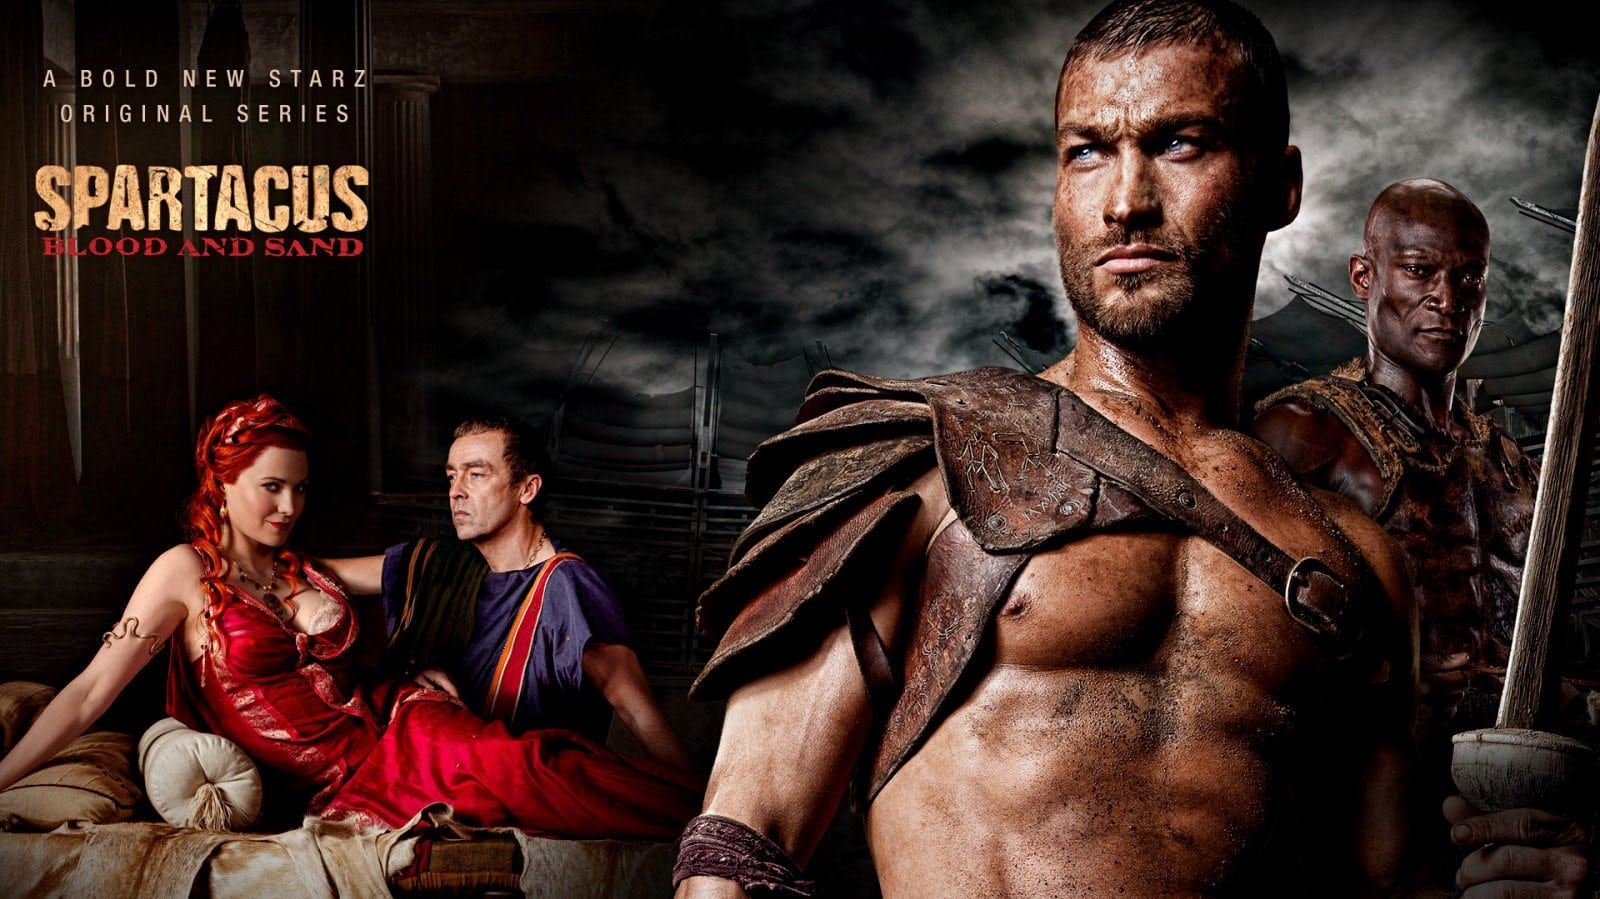 SPARTACUS-spartacus-blood-and-sand-10535717-1600-1200